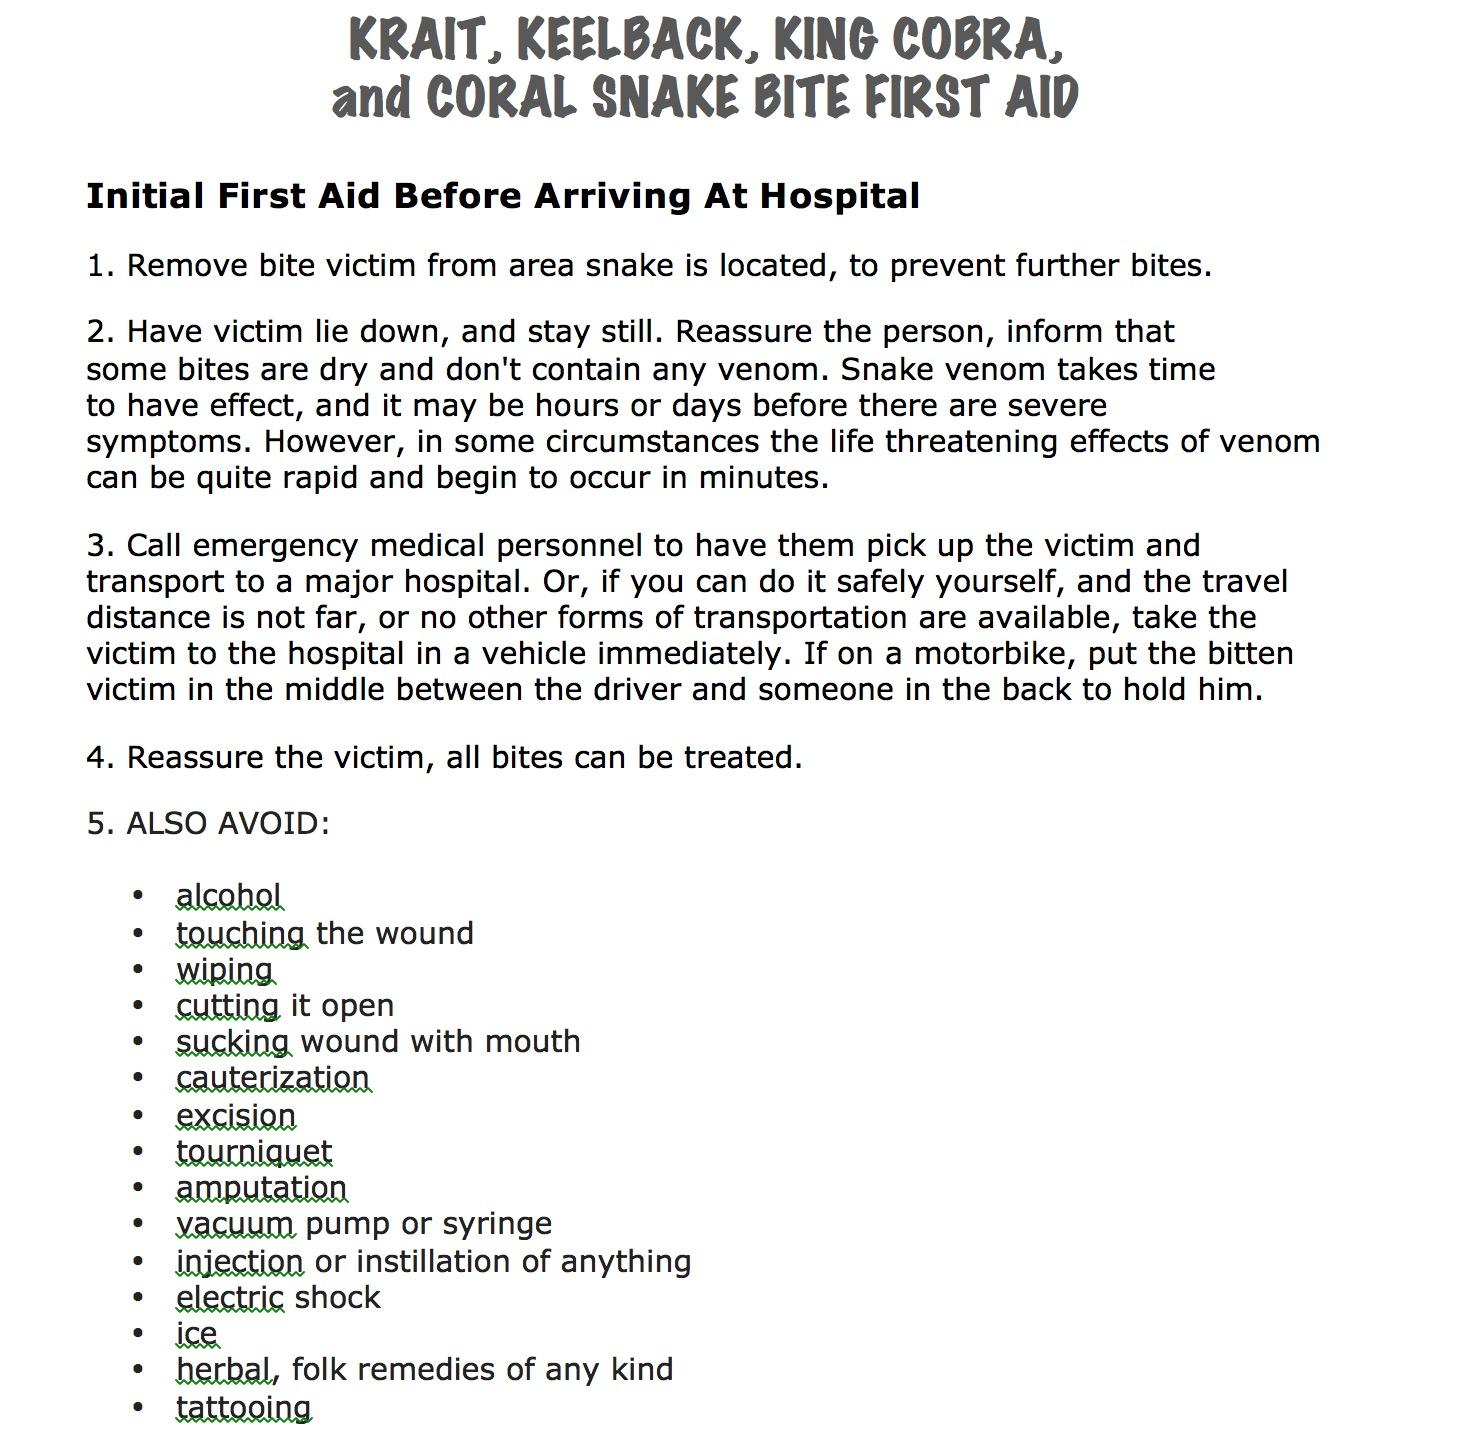 Snakebite First Aid - Cobra, Krait, Coral Snakes, Keelbacks Part 1